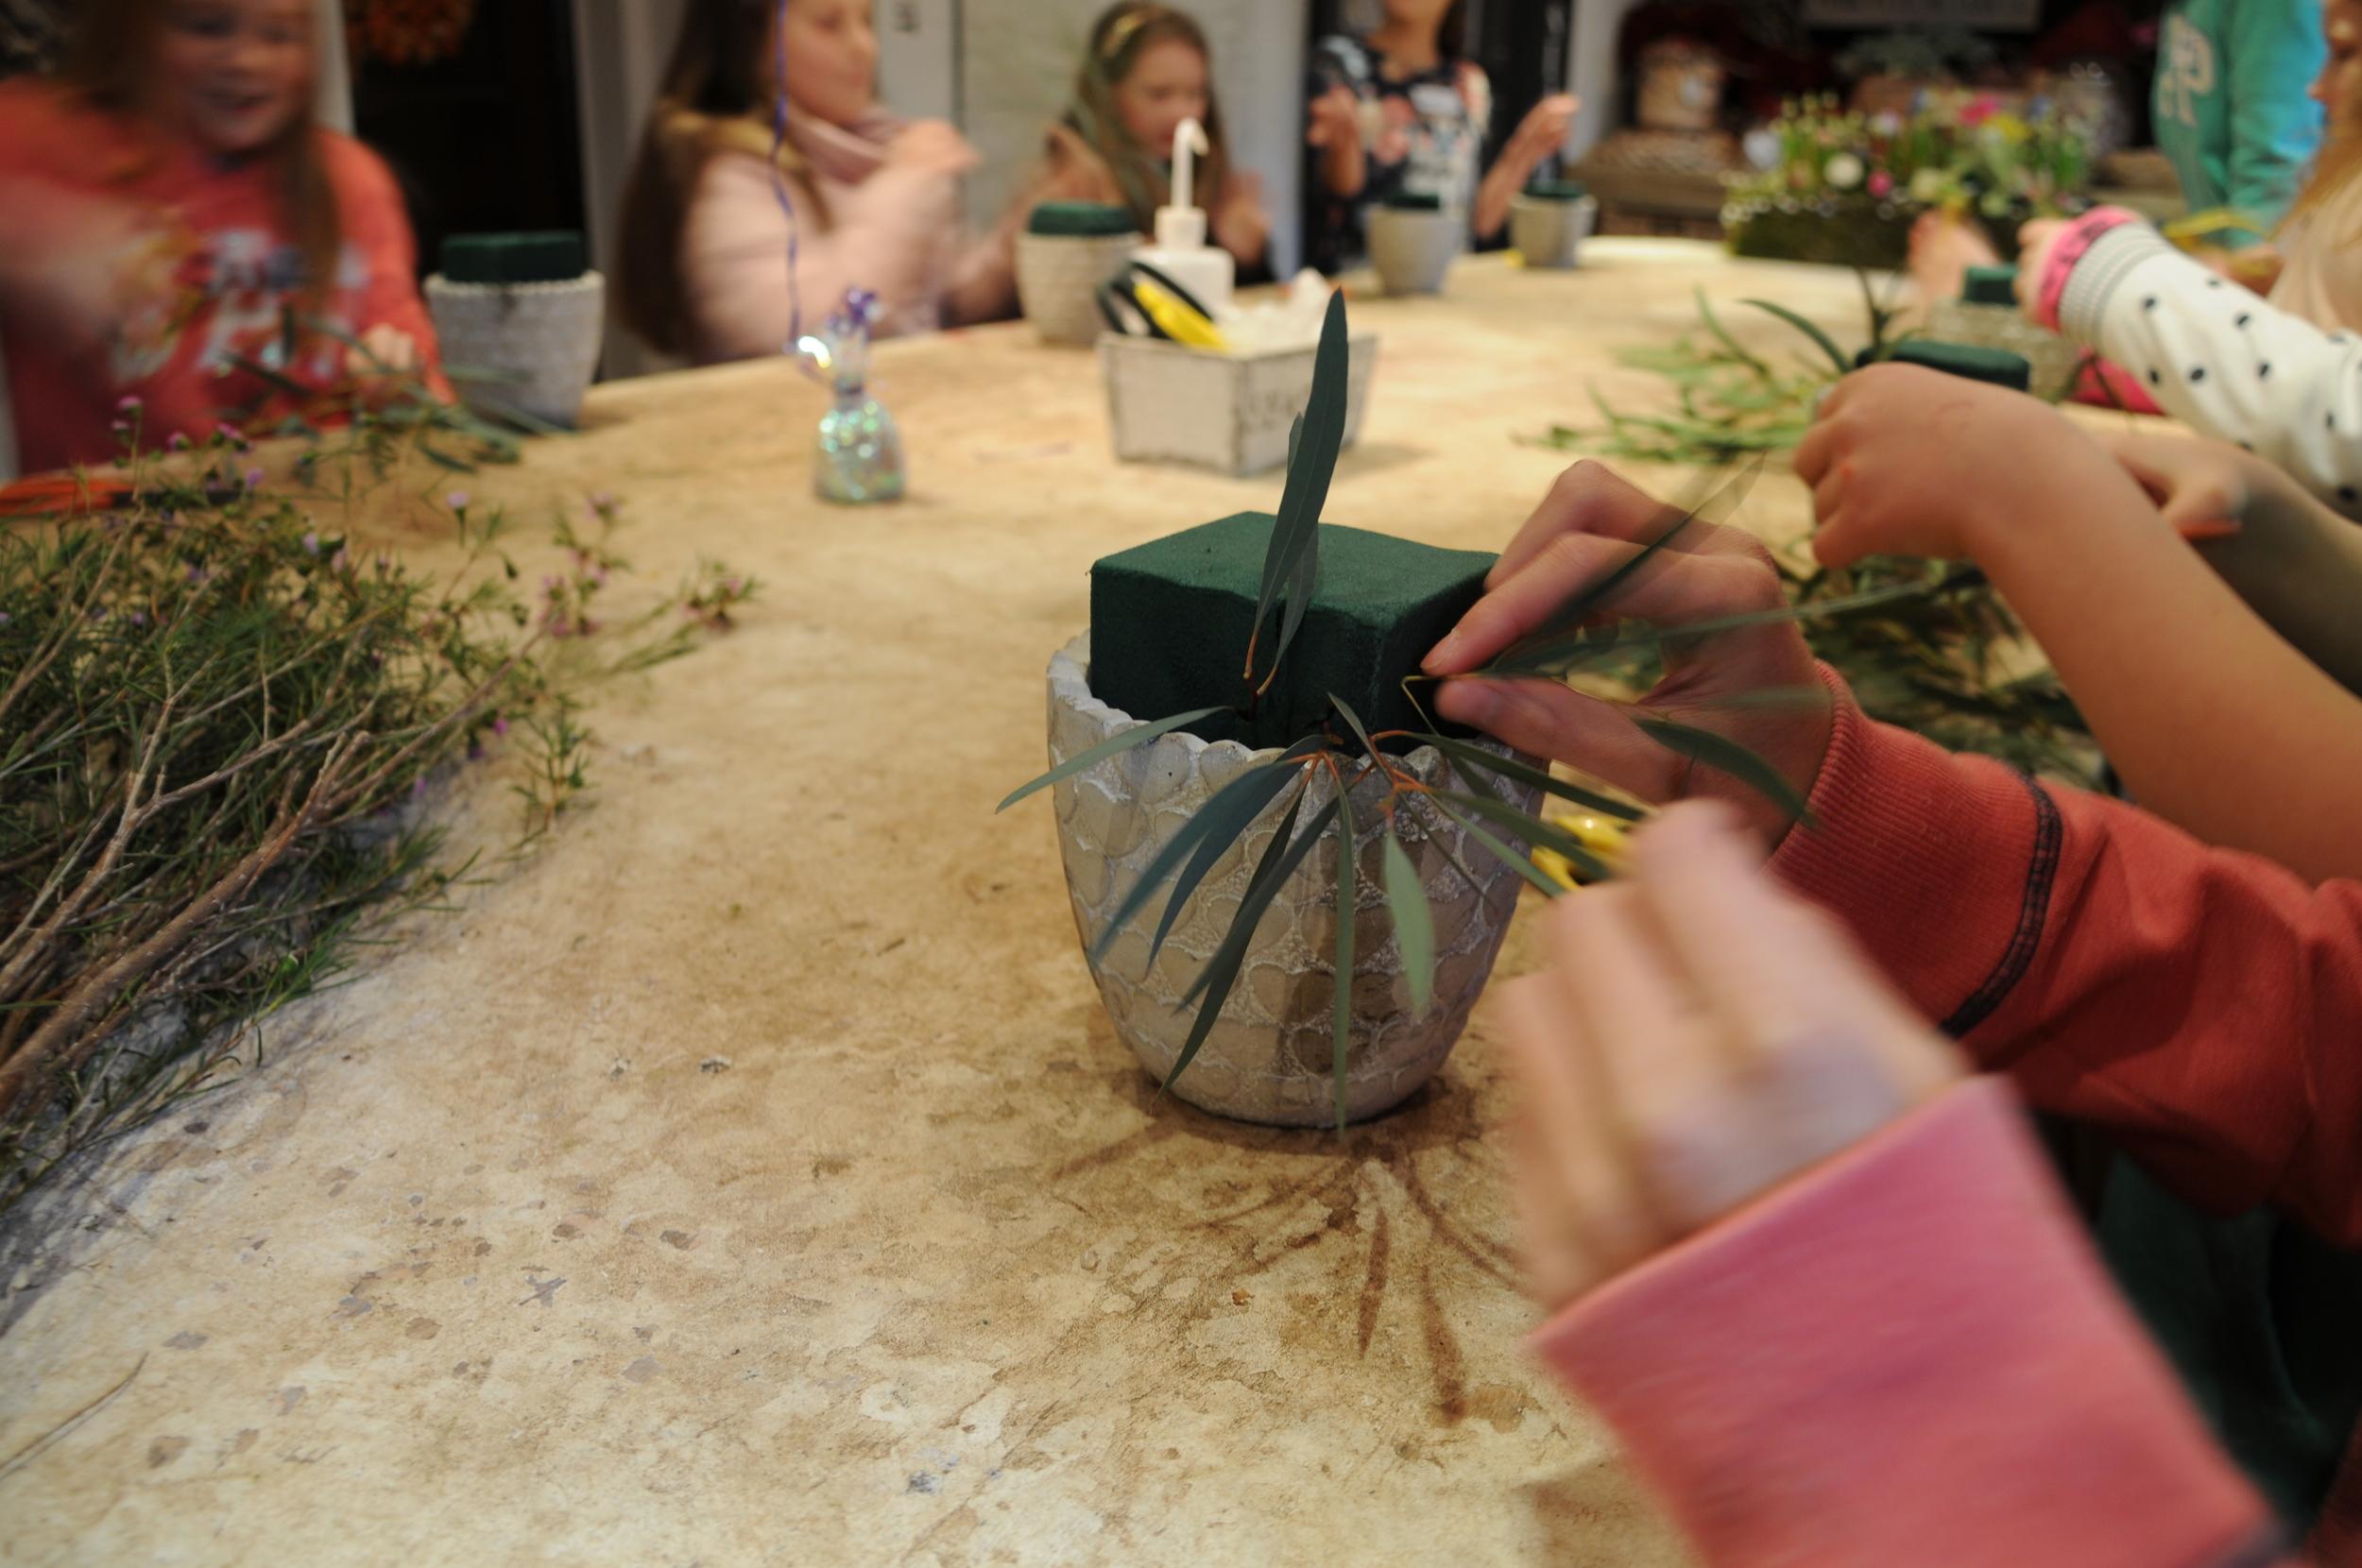 Adding foliage to the pots